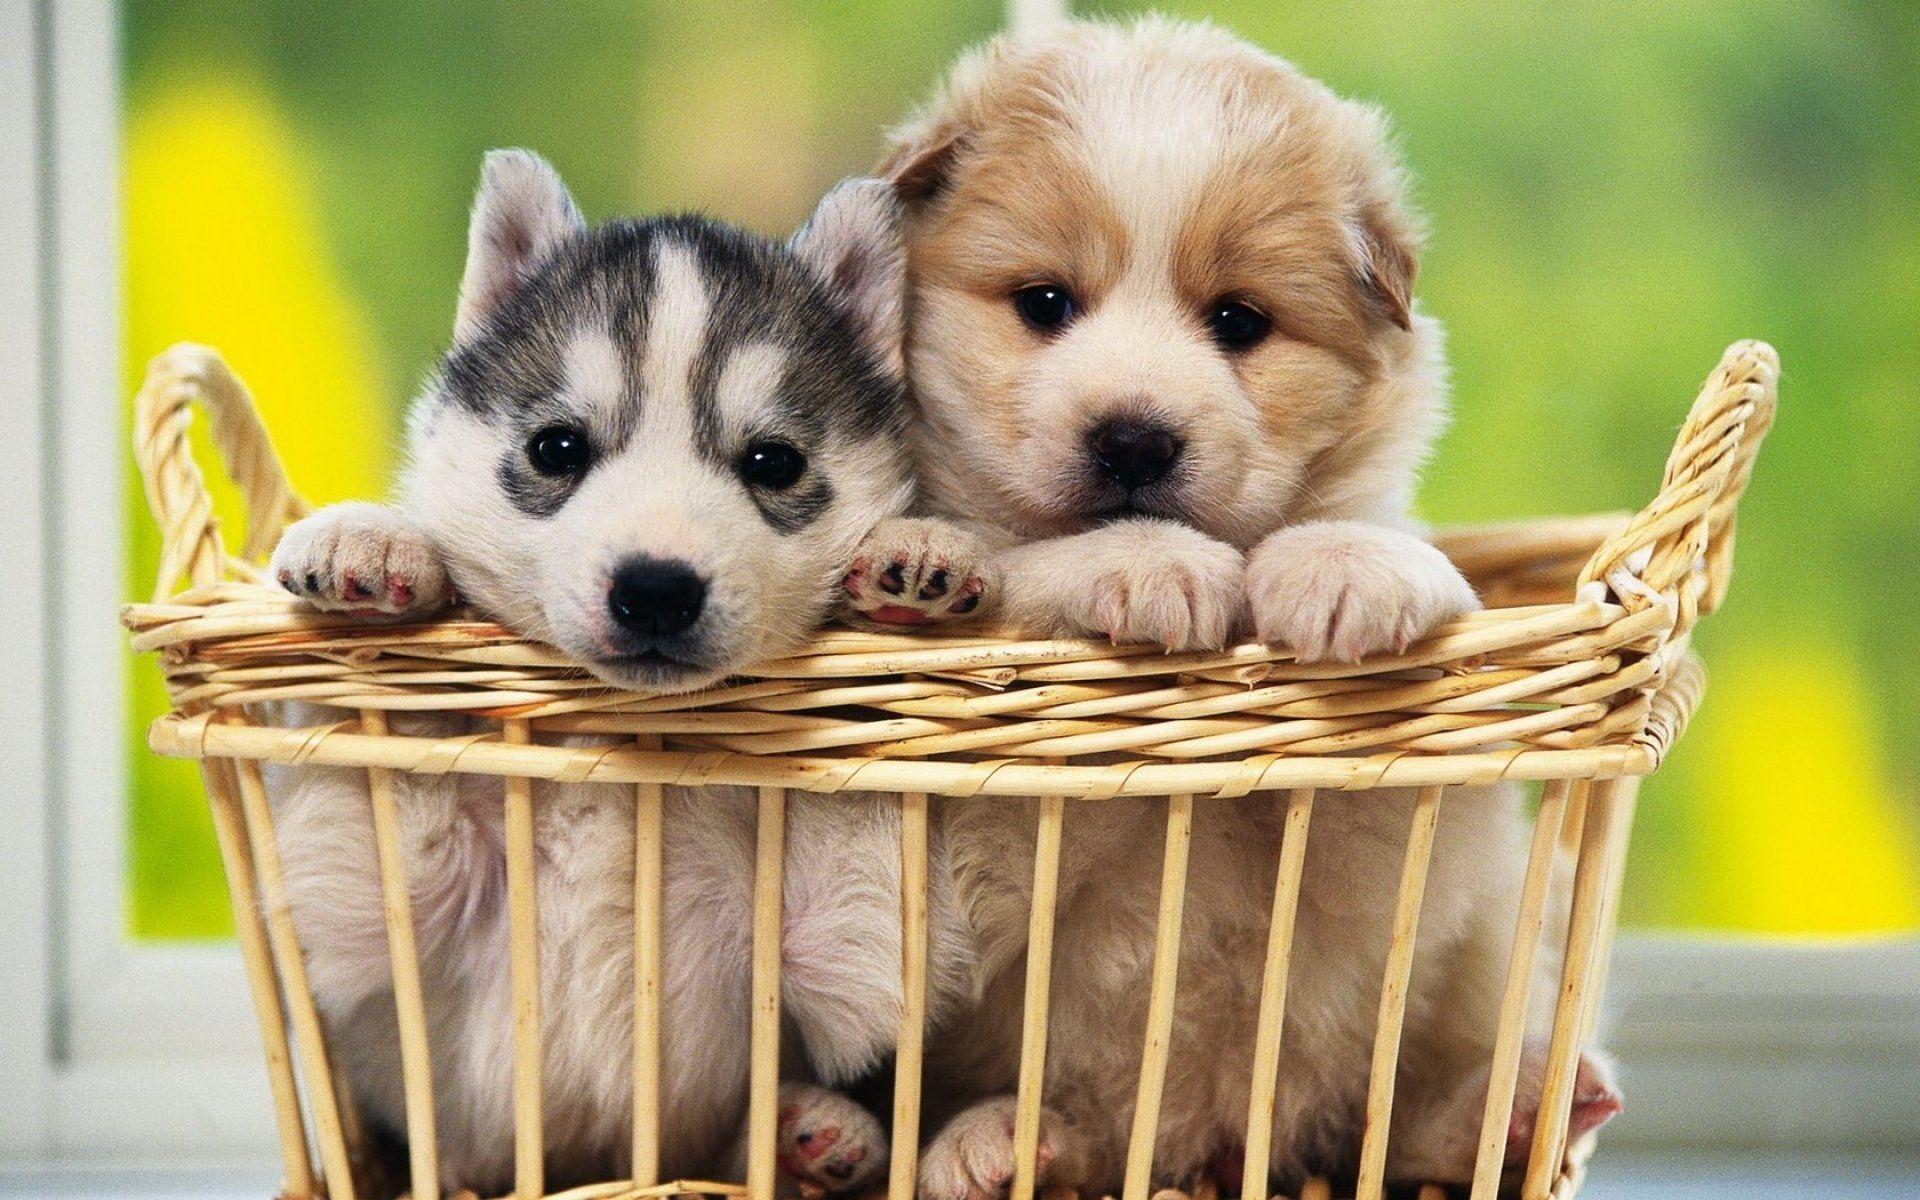 pinhalo media on dog lovers | pinterest | wallpaper